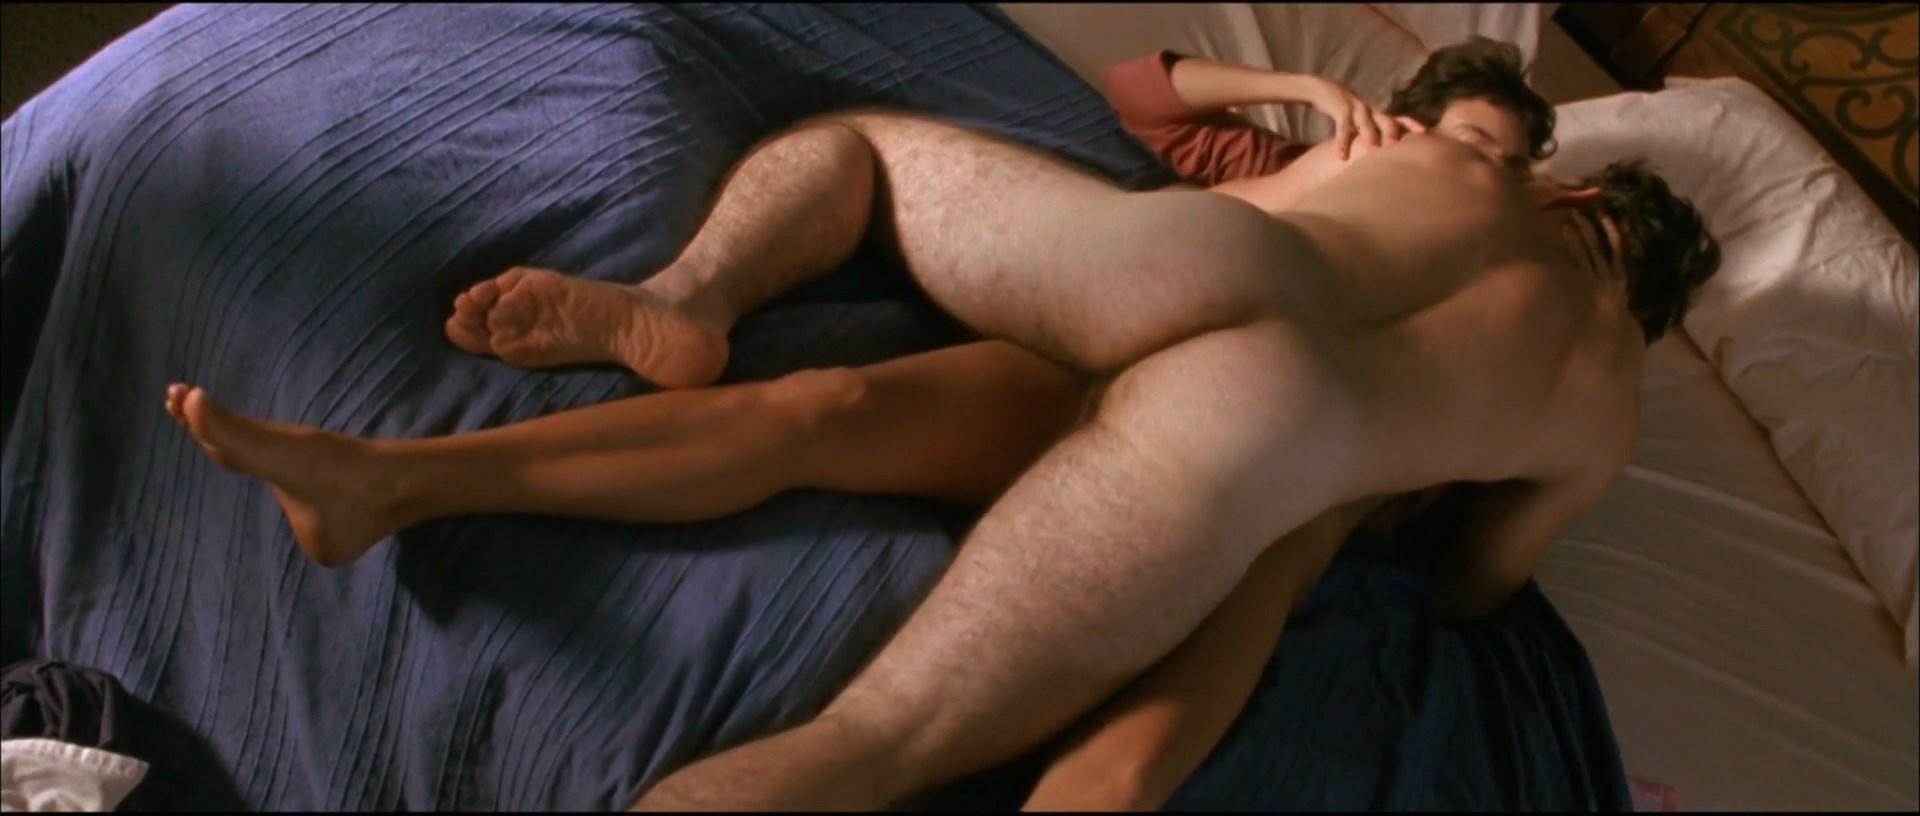 Naked girls pink sock